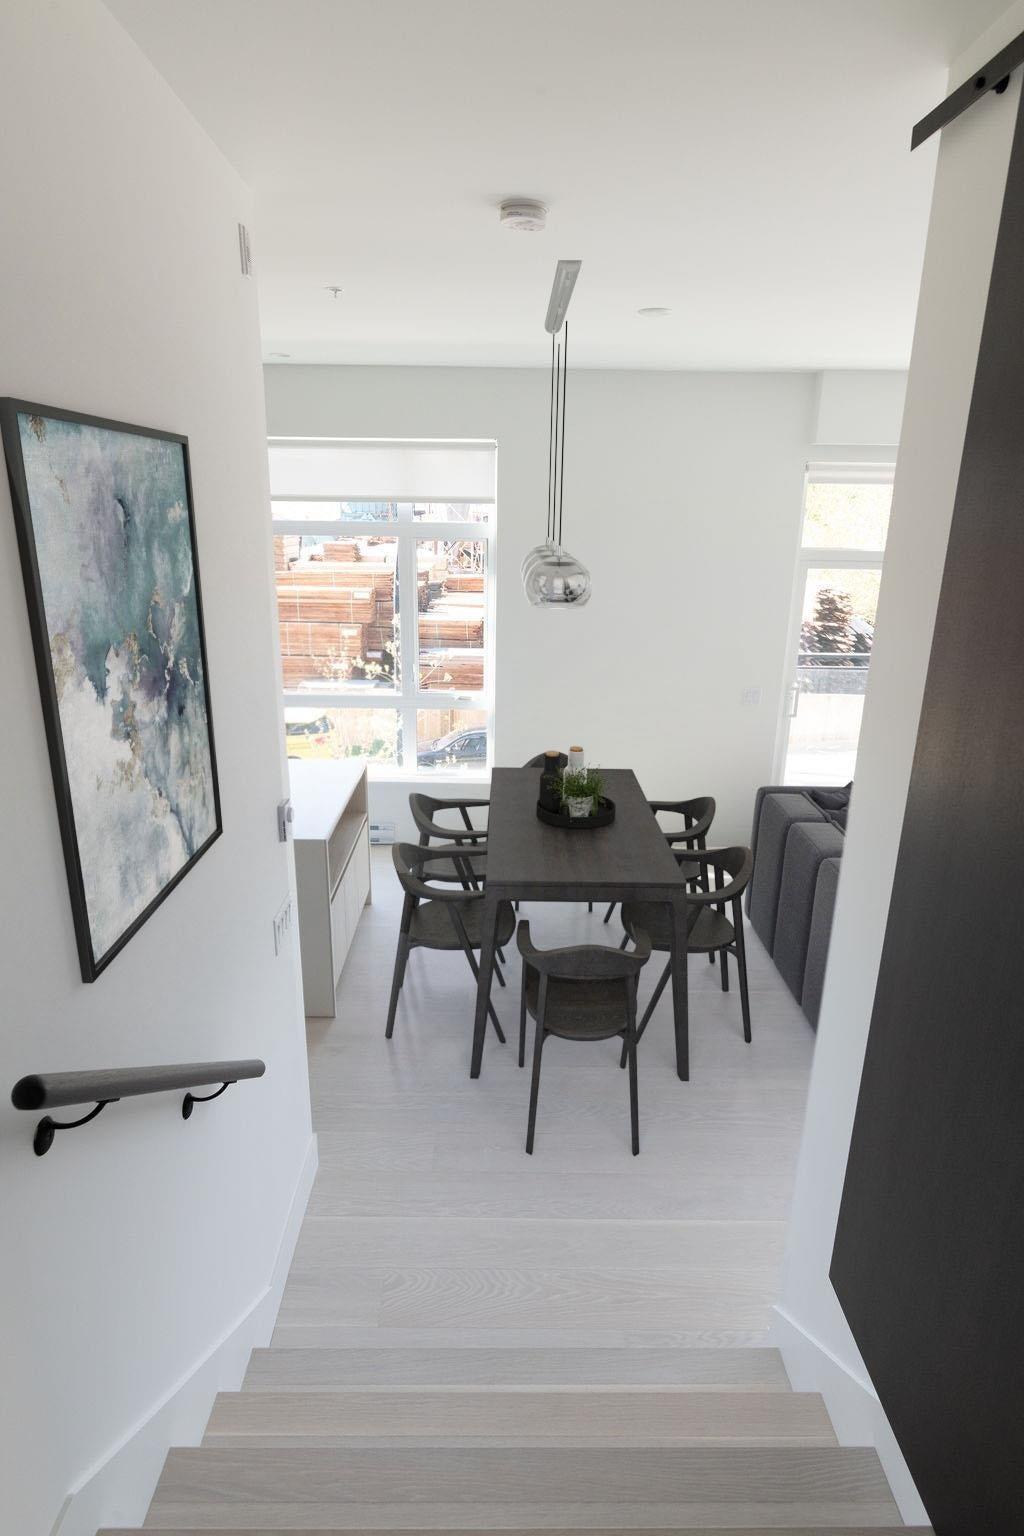 305 300 SALTER STREET - Queensborough Apartment/Condo for sale, 1 Bedroom (R2620504)